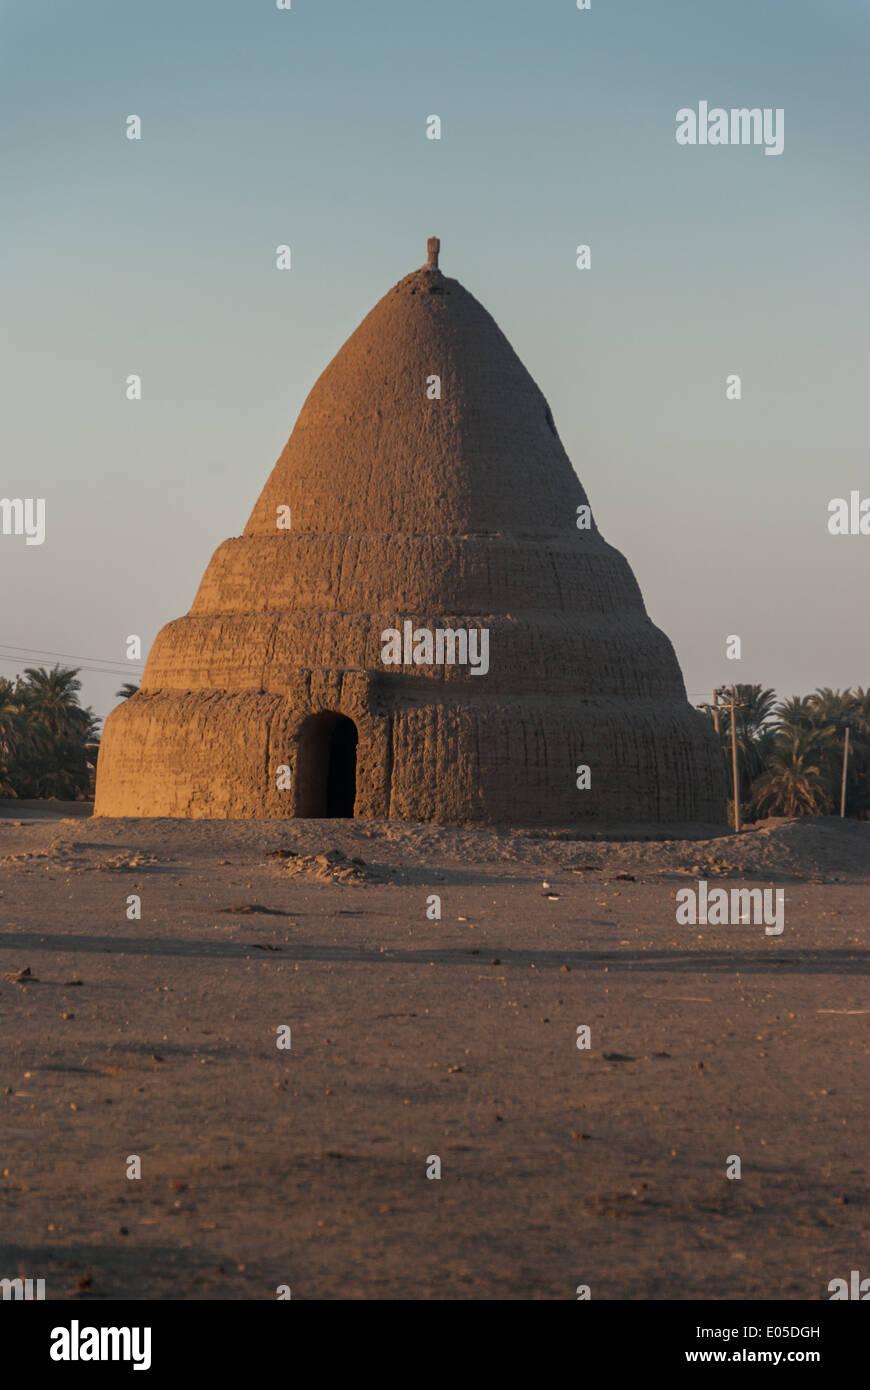 Qubba, Kerma, northern Sudan - Stock Image